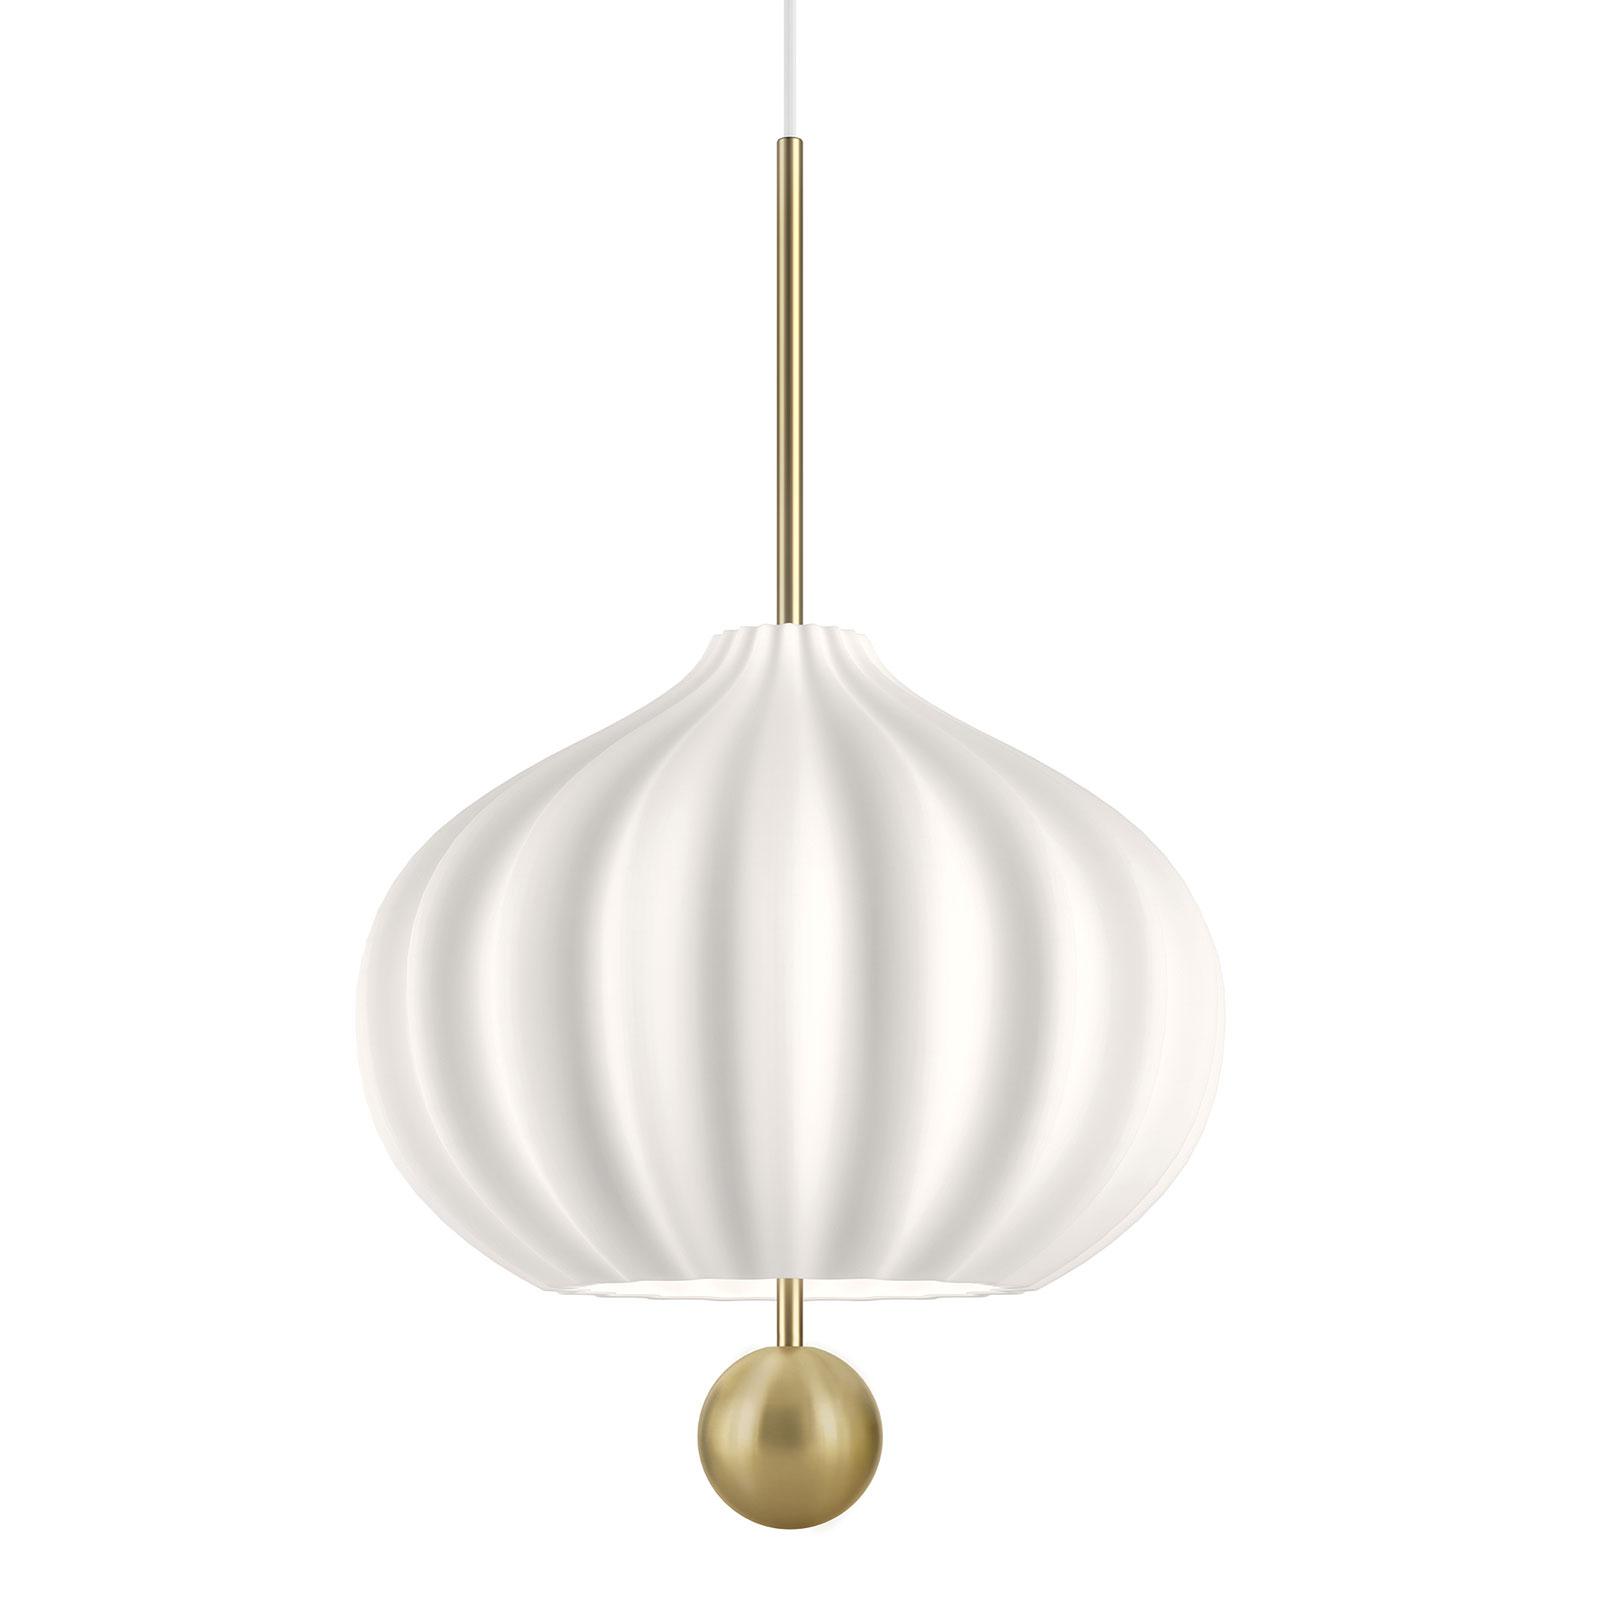 Kundalini Lilli hanglamp van glas en messing